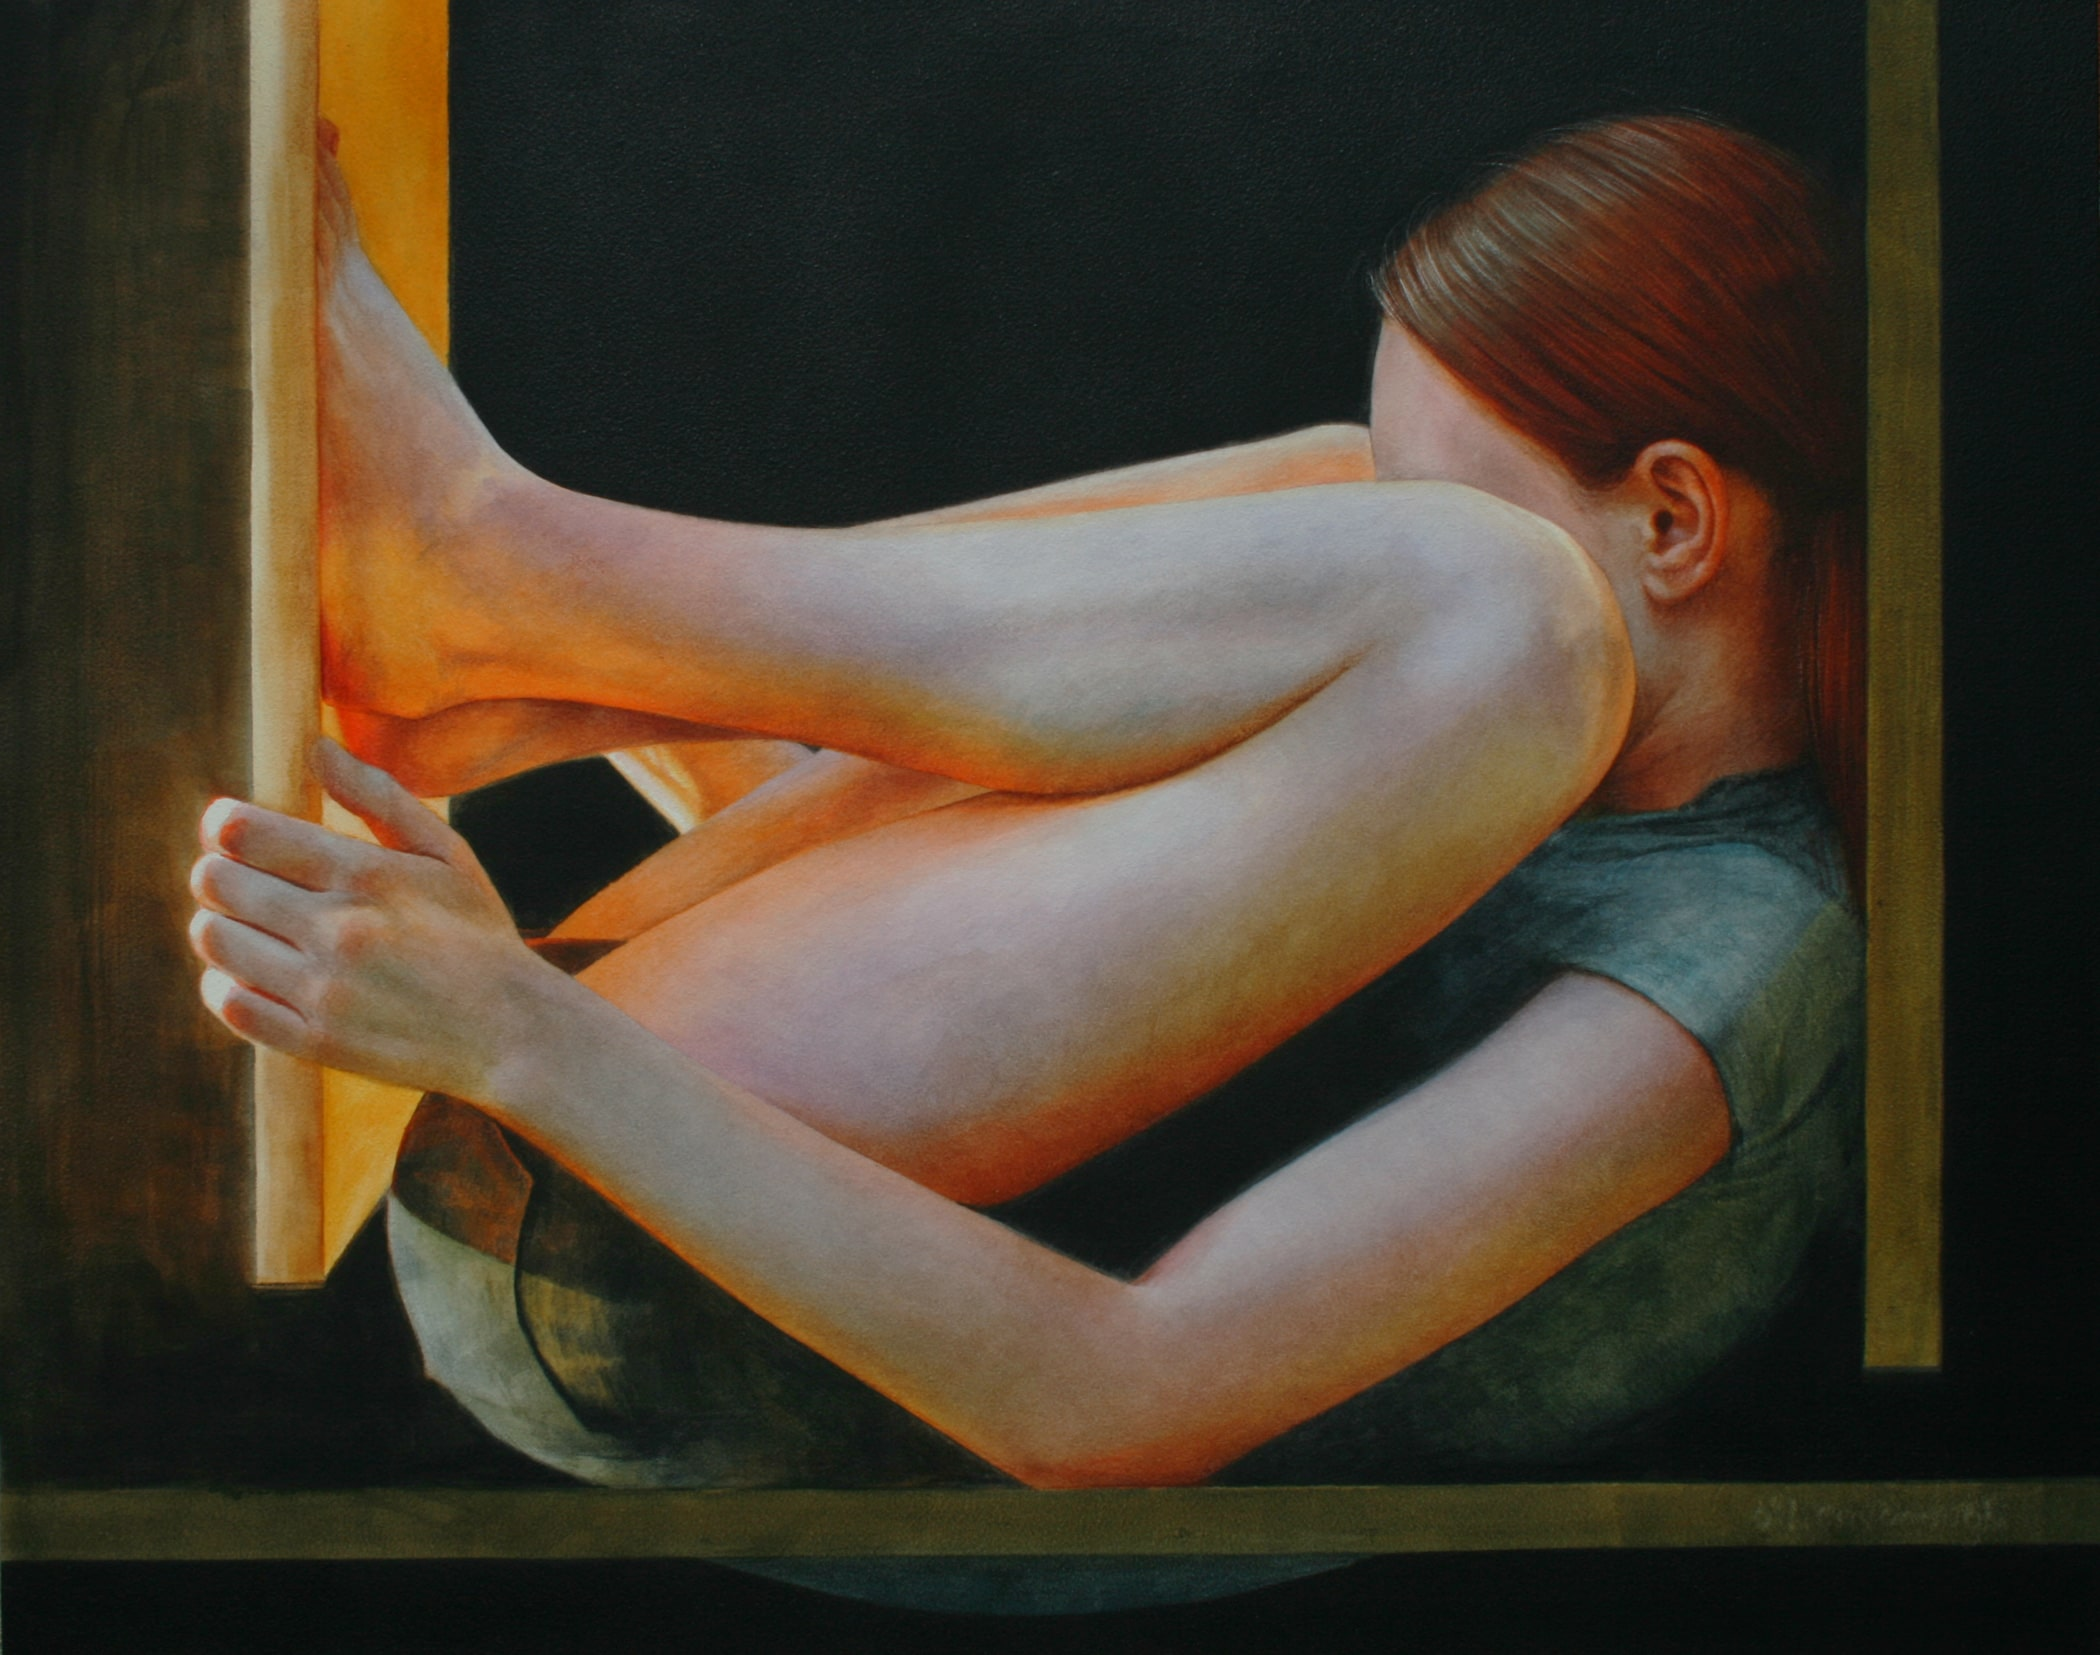 Ali Cavanaugh,  Effect  (2015), fresco, 16 x 20 inches